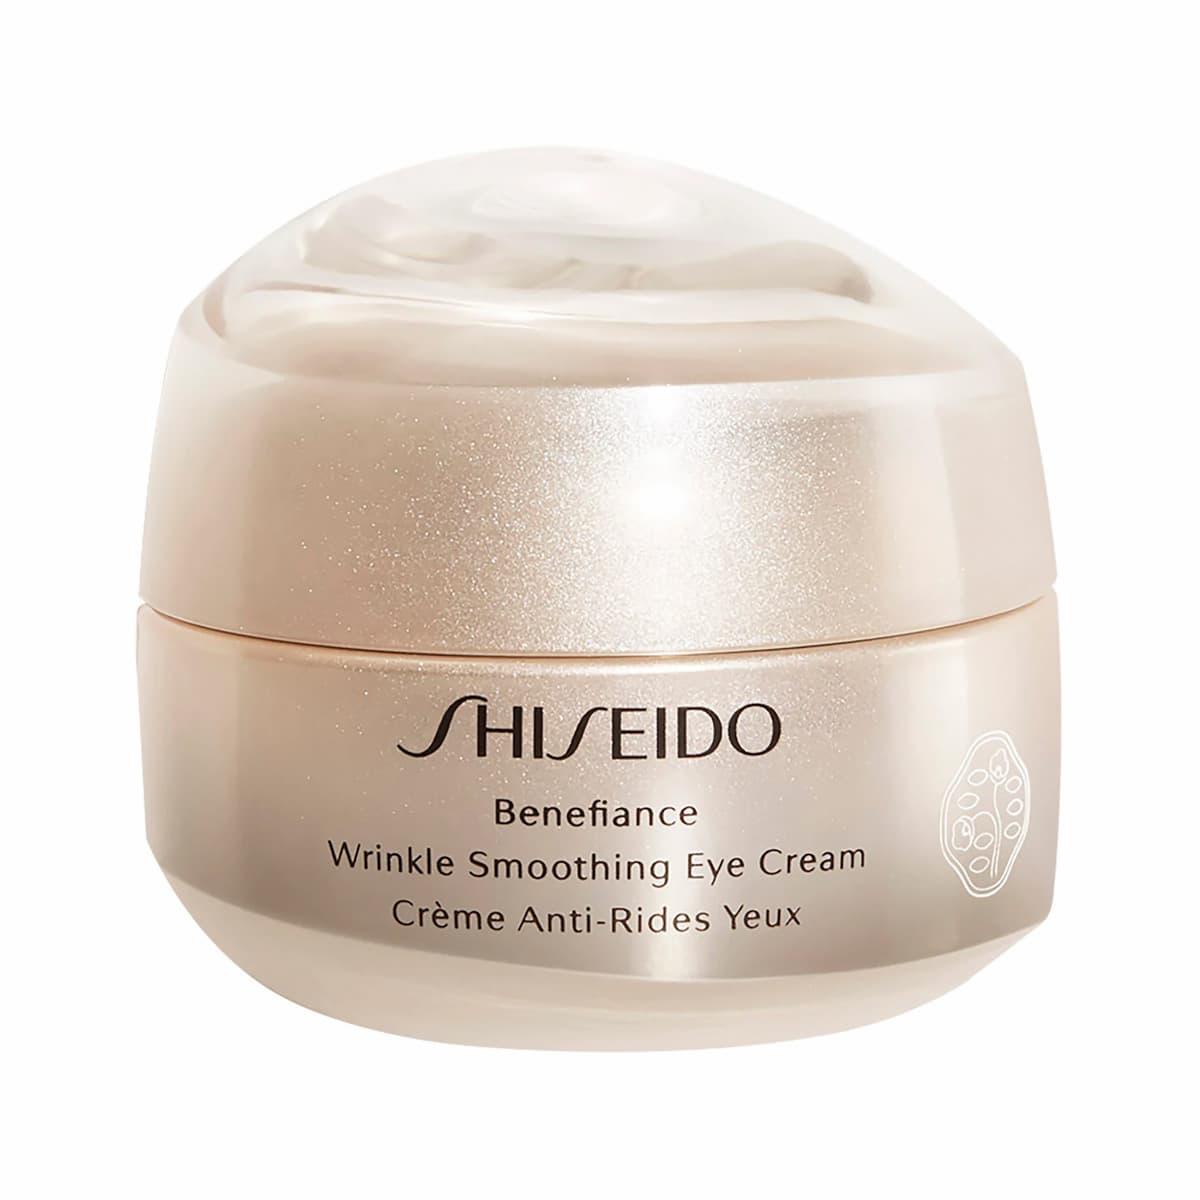 Shiseido - Benefiance - Crème Anti-Rides Yeux 15 ml